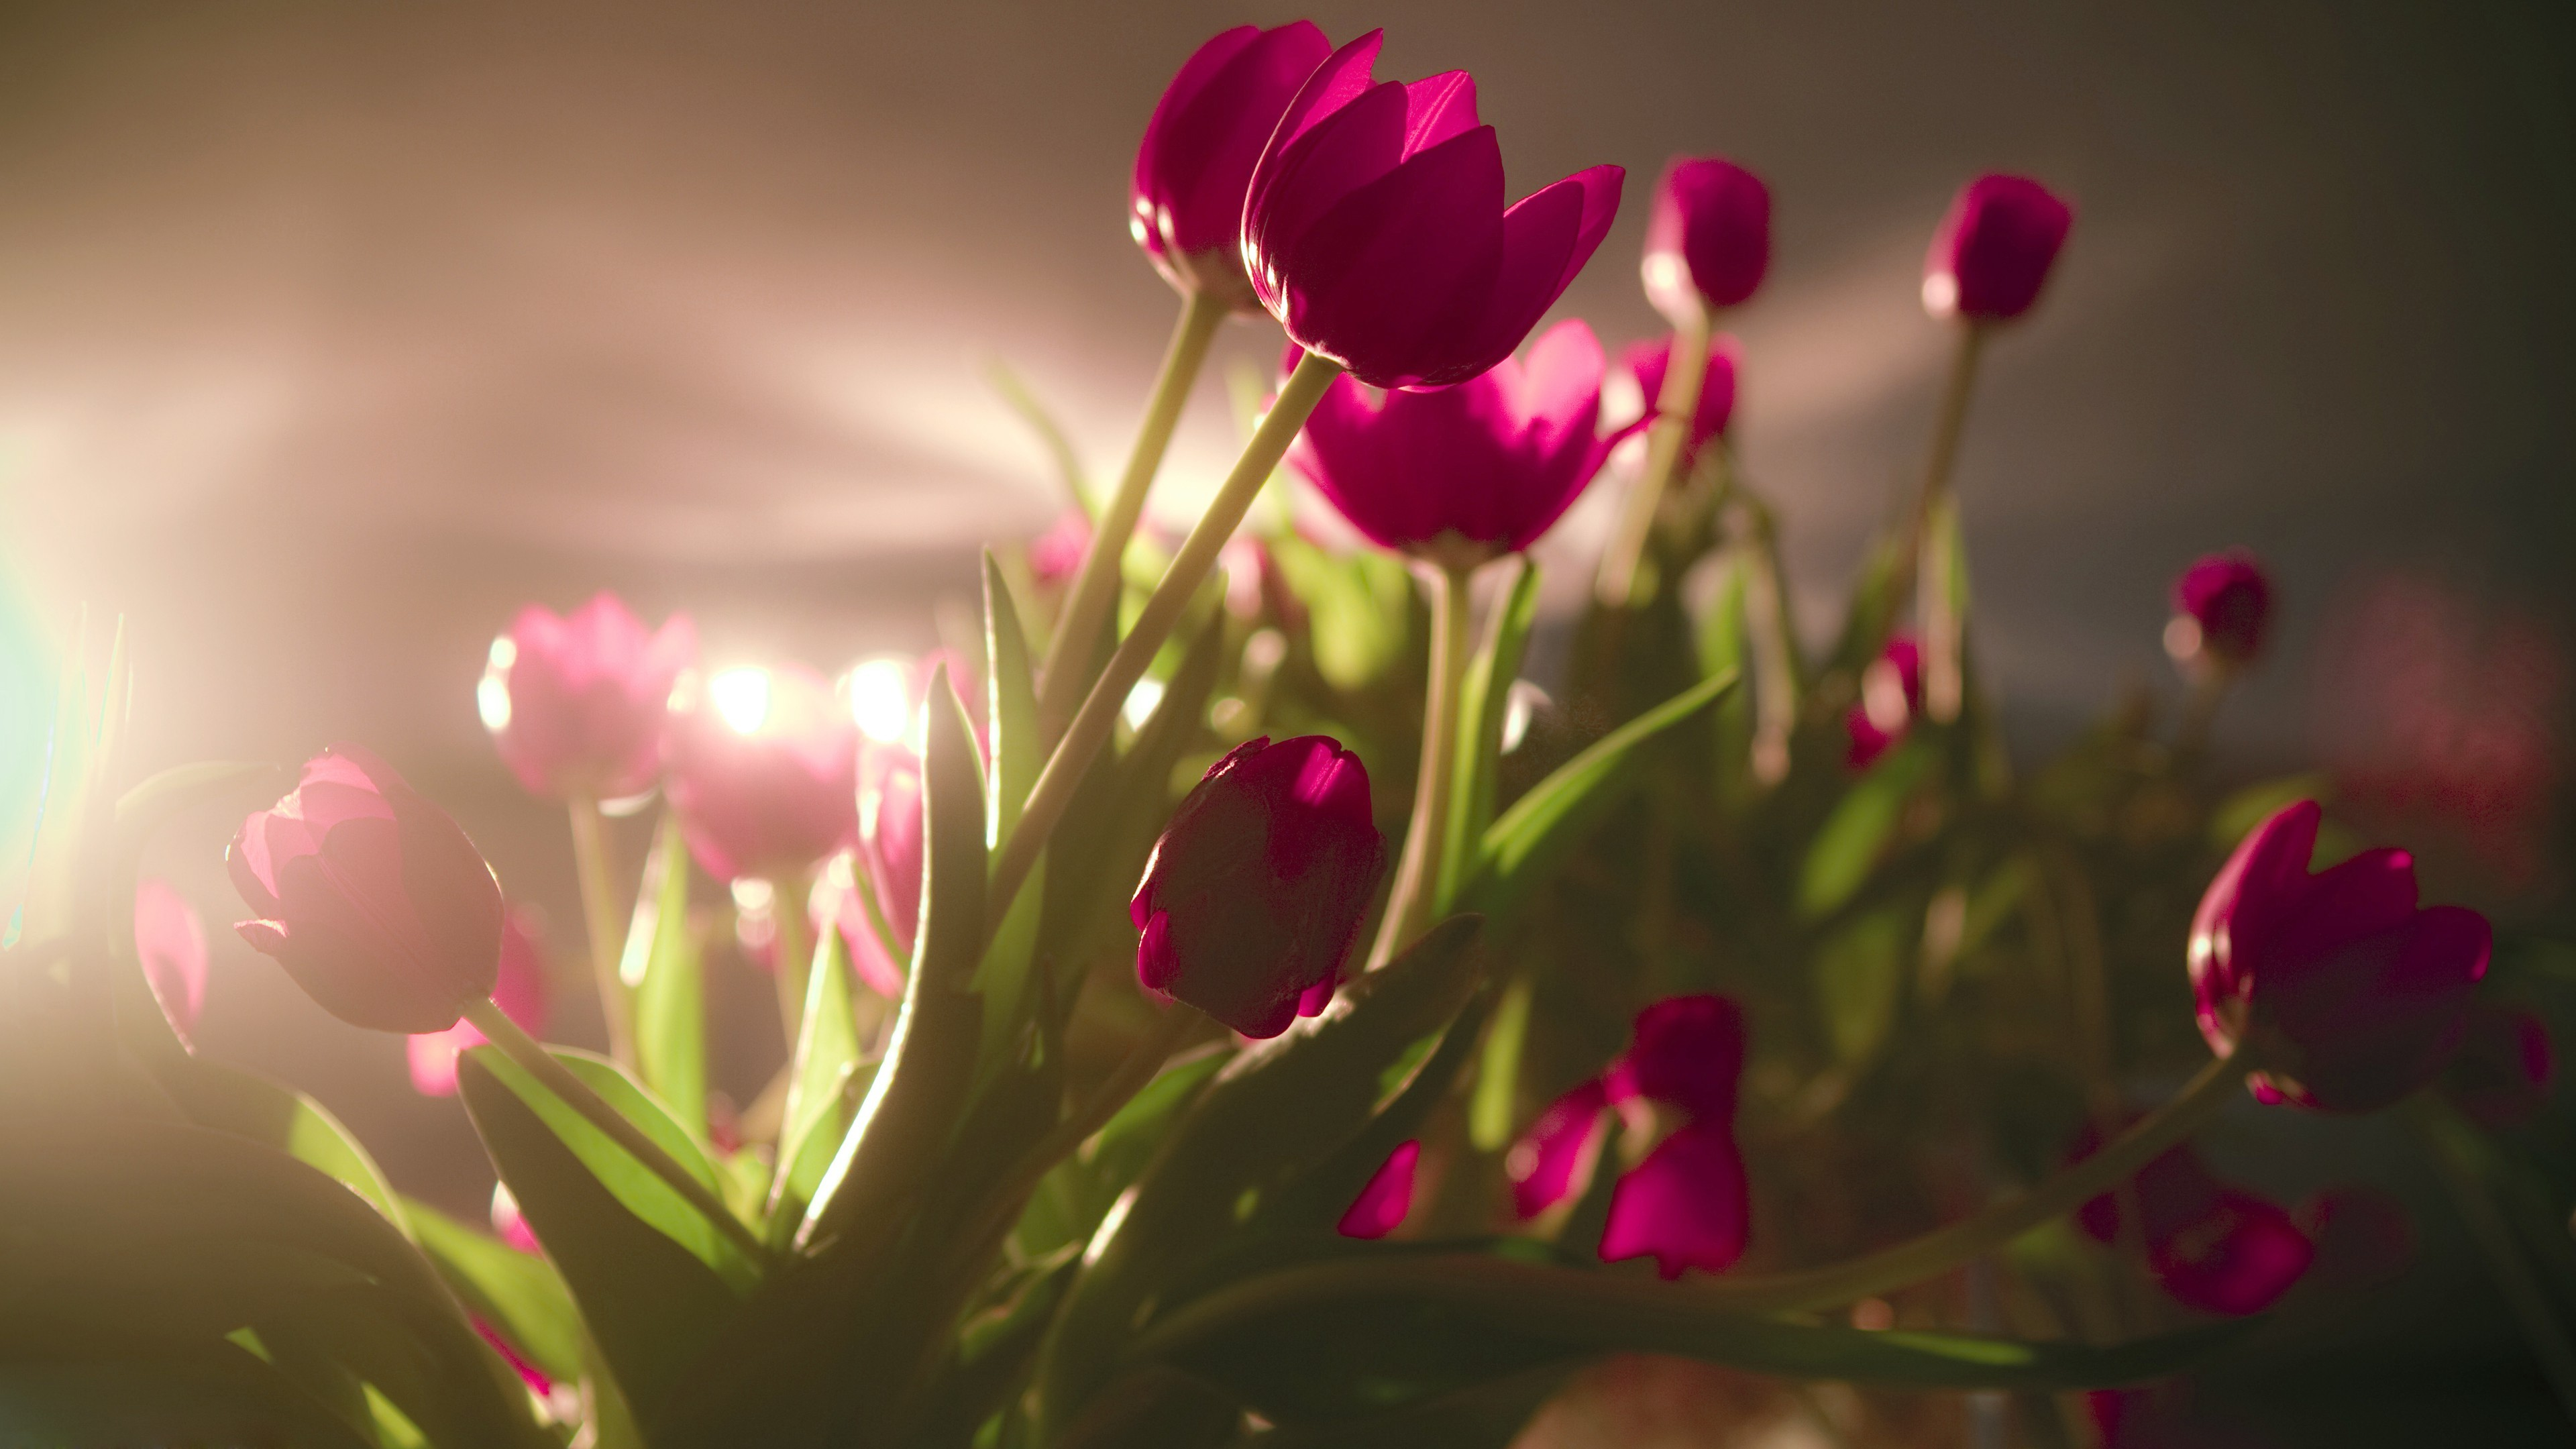 Beautiful Flowers Tulip Hd Wallpapers Images Data Src High Resolution Tulip Flower 3840x2160 Download Hd Wallpaper Wallpapertip